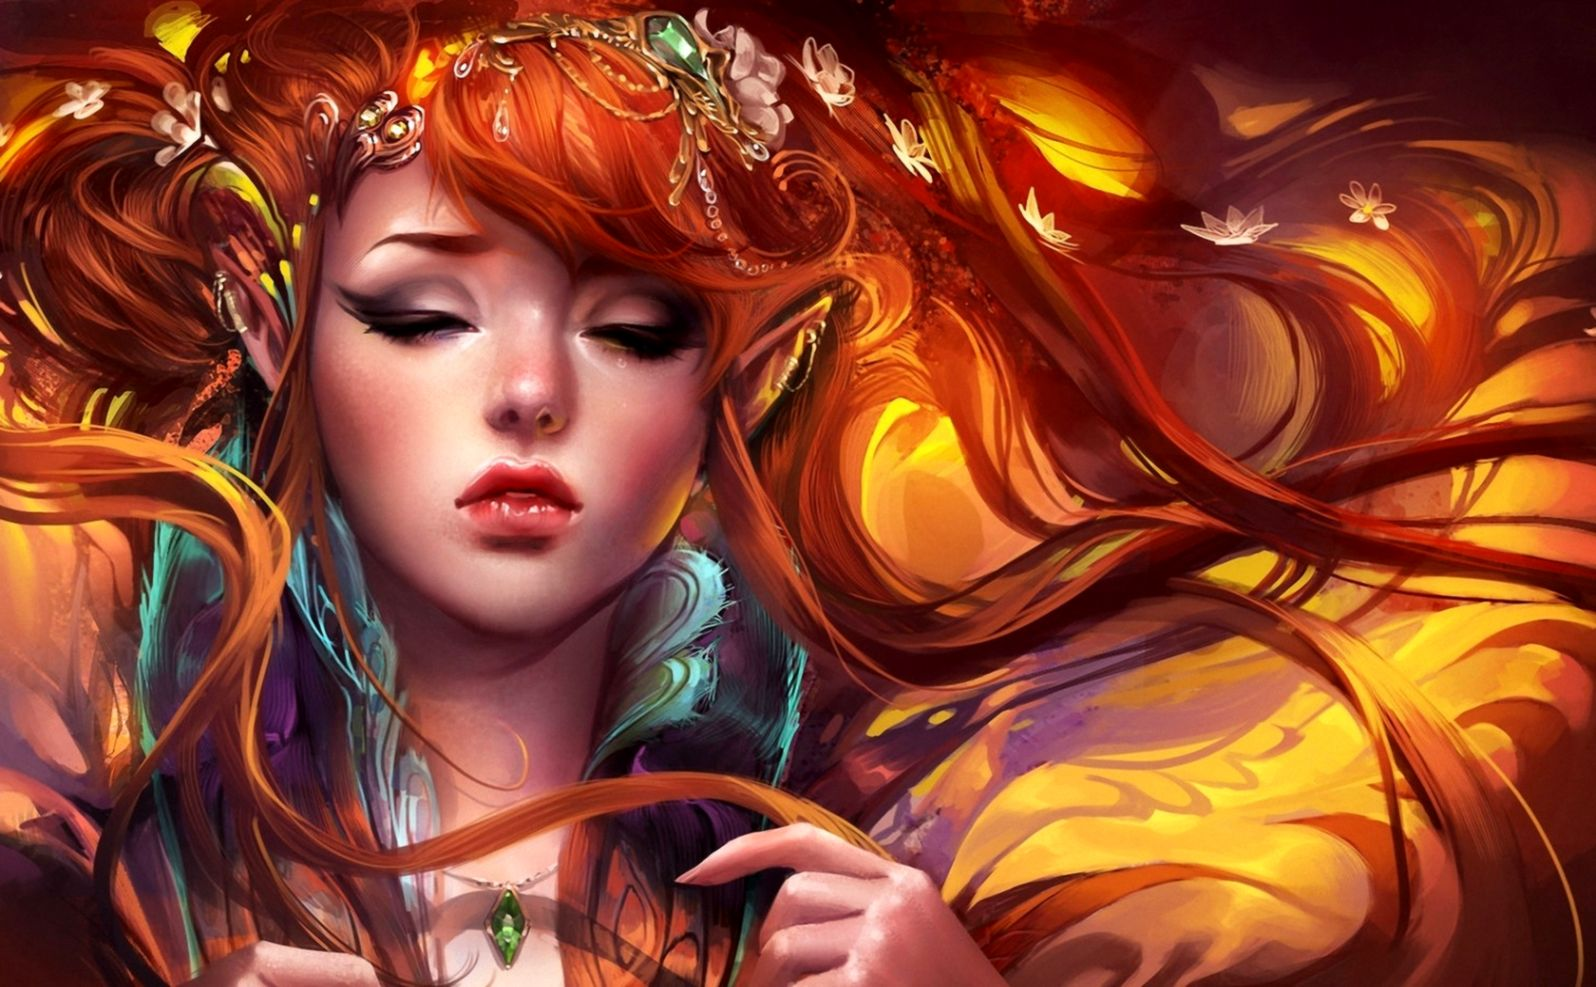 Digital Art Fantasy Woman Wallpaper